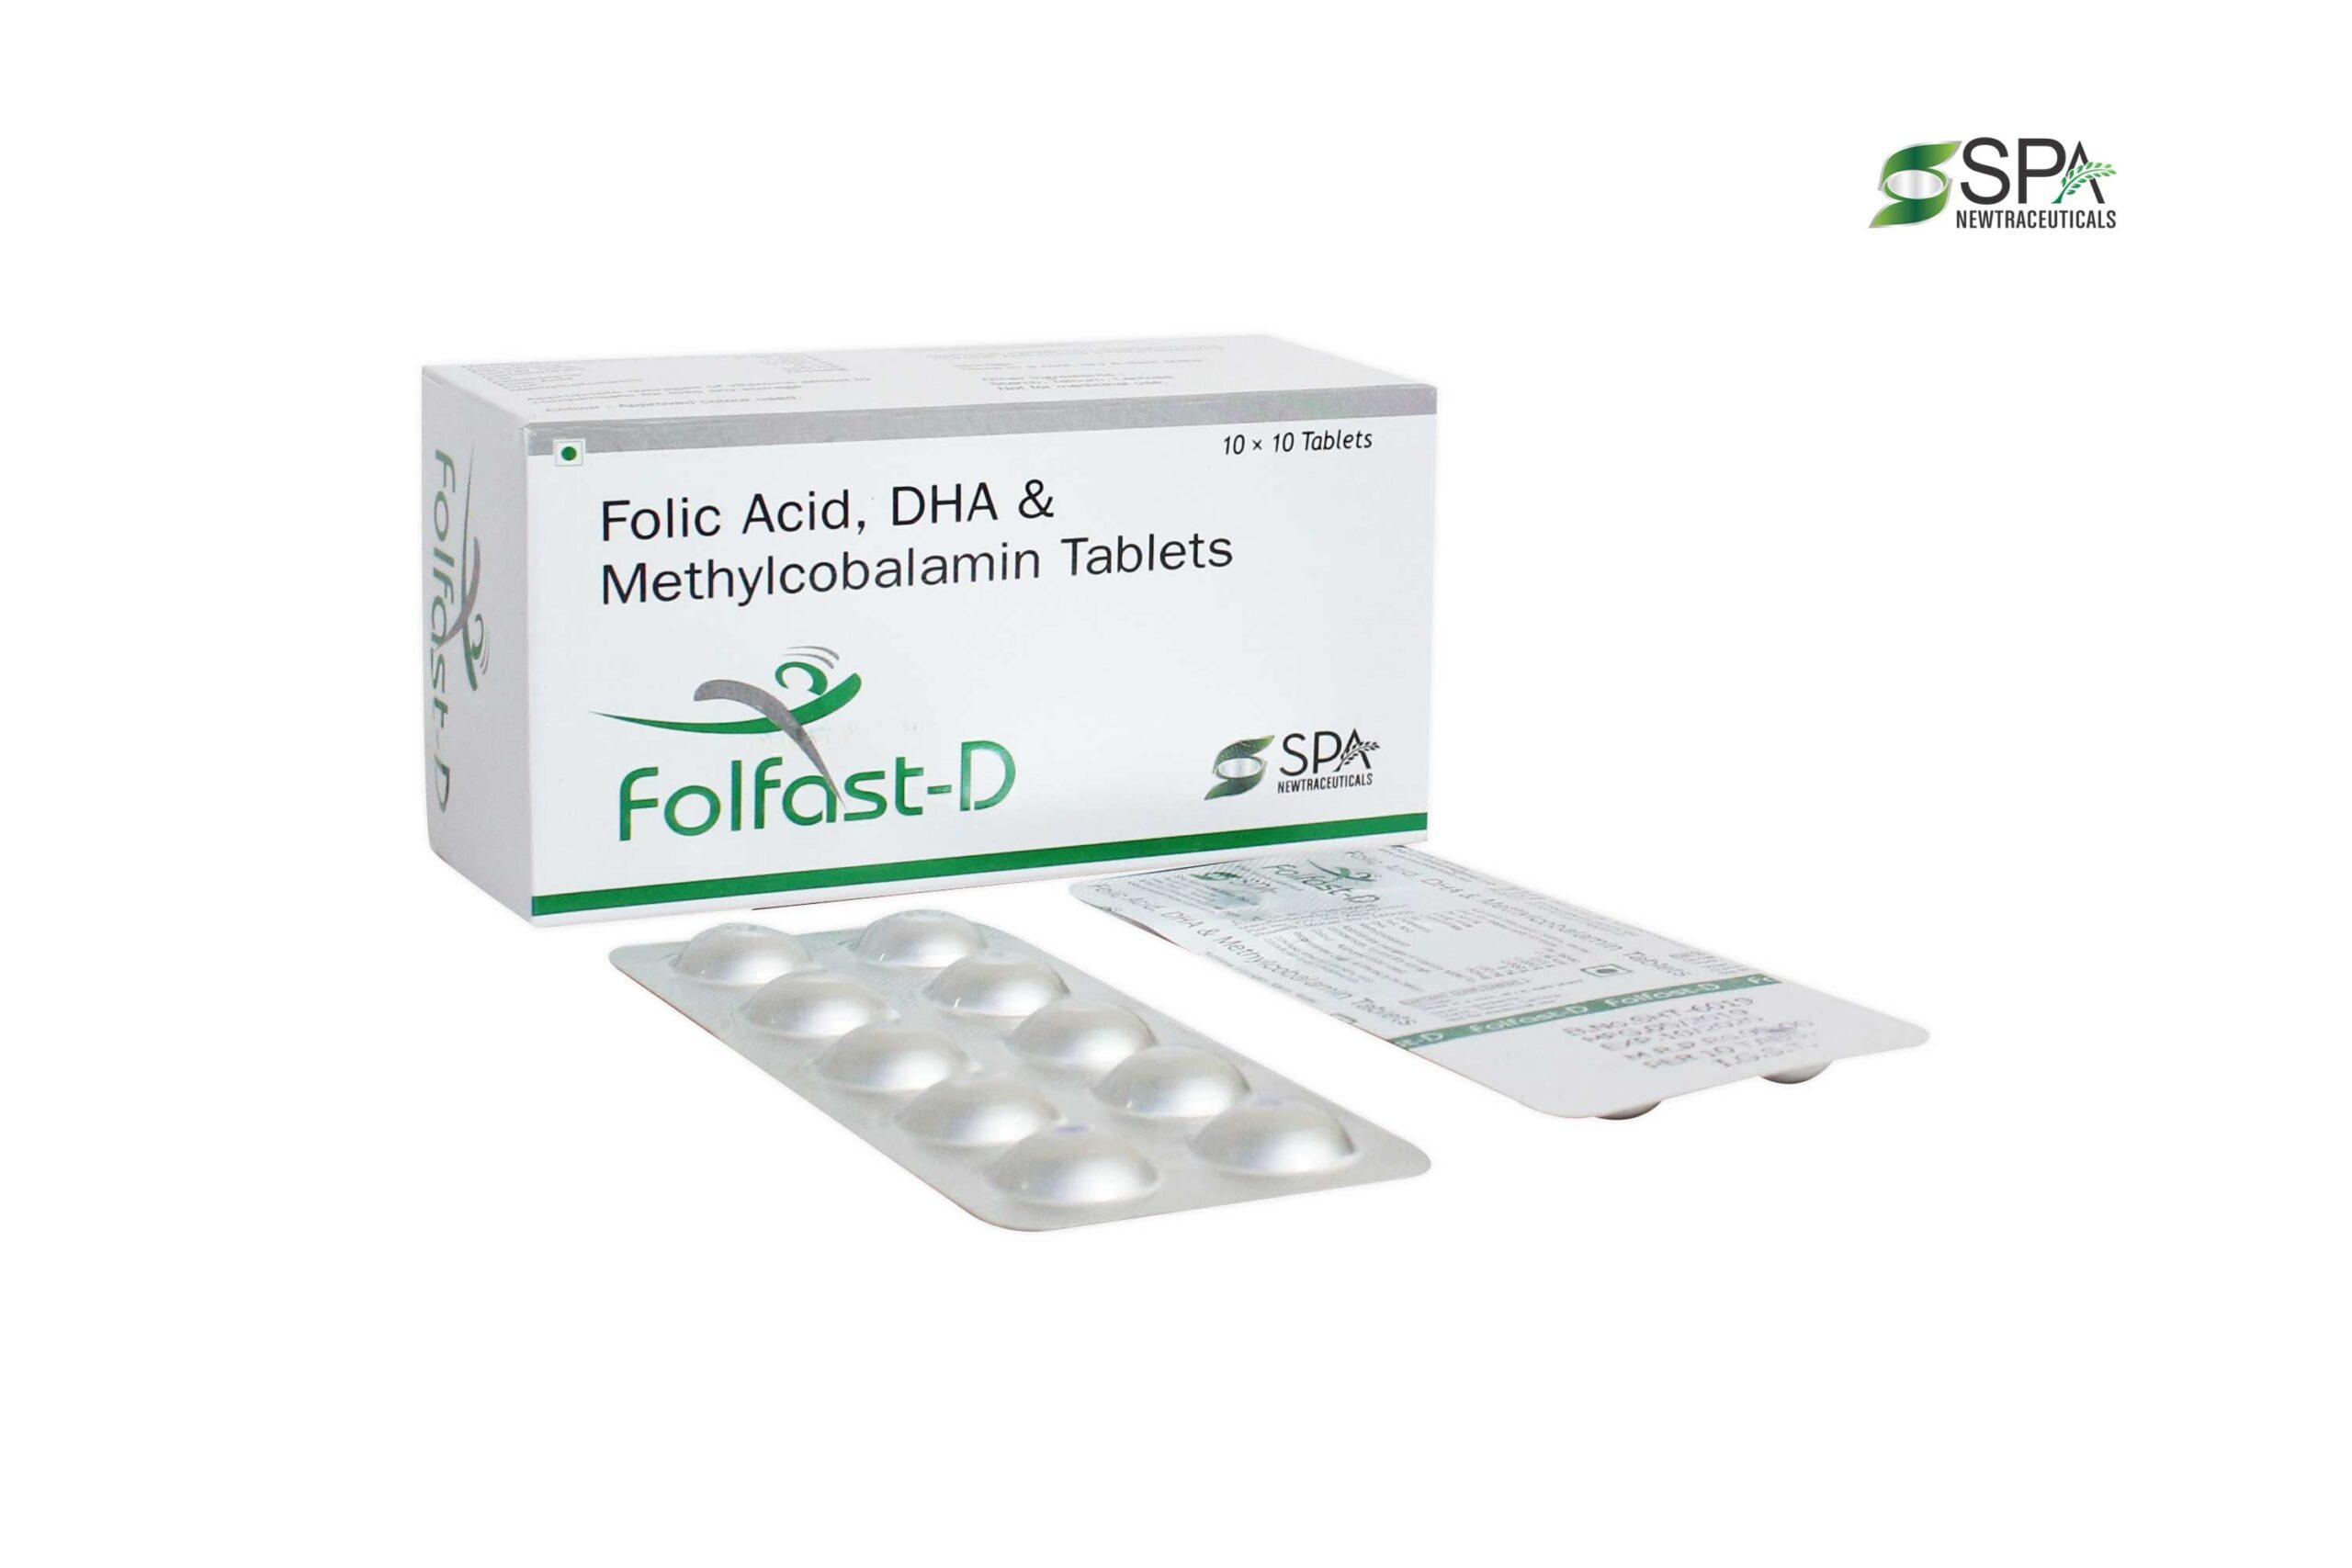 Folfast-D